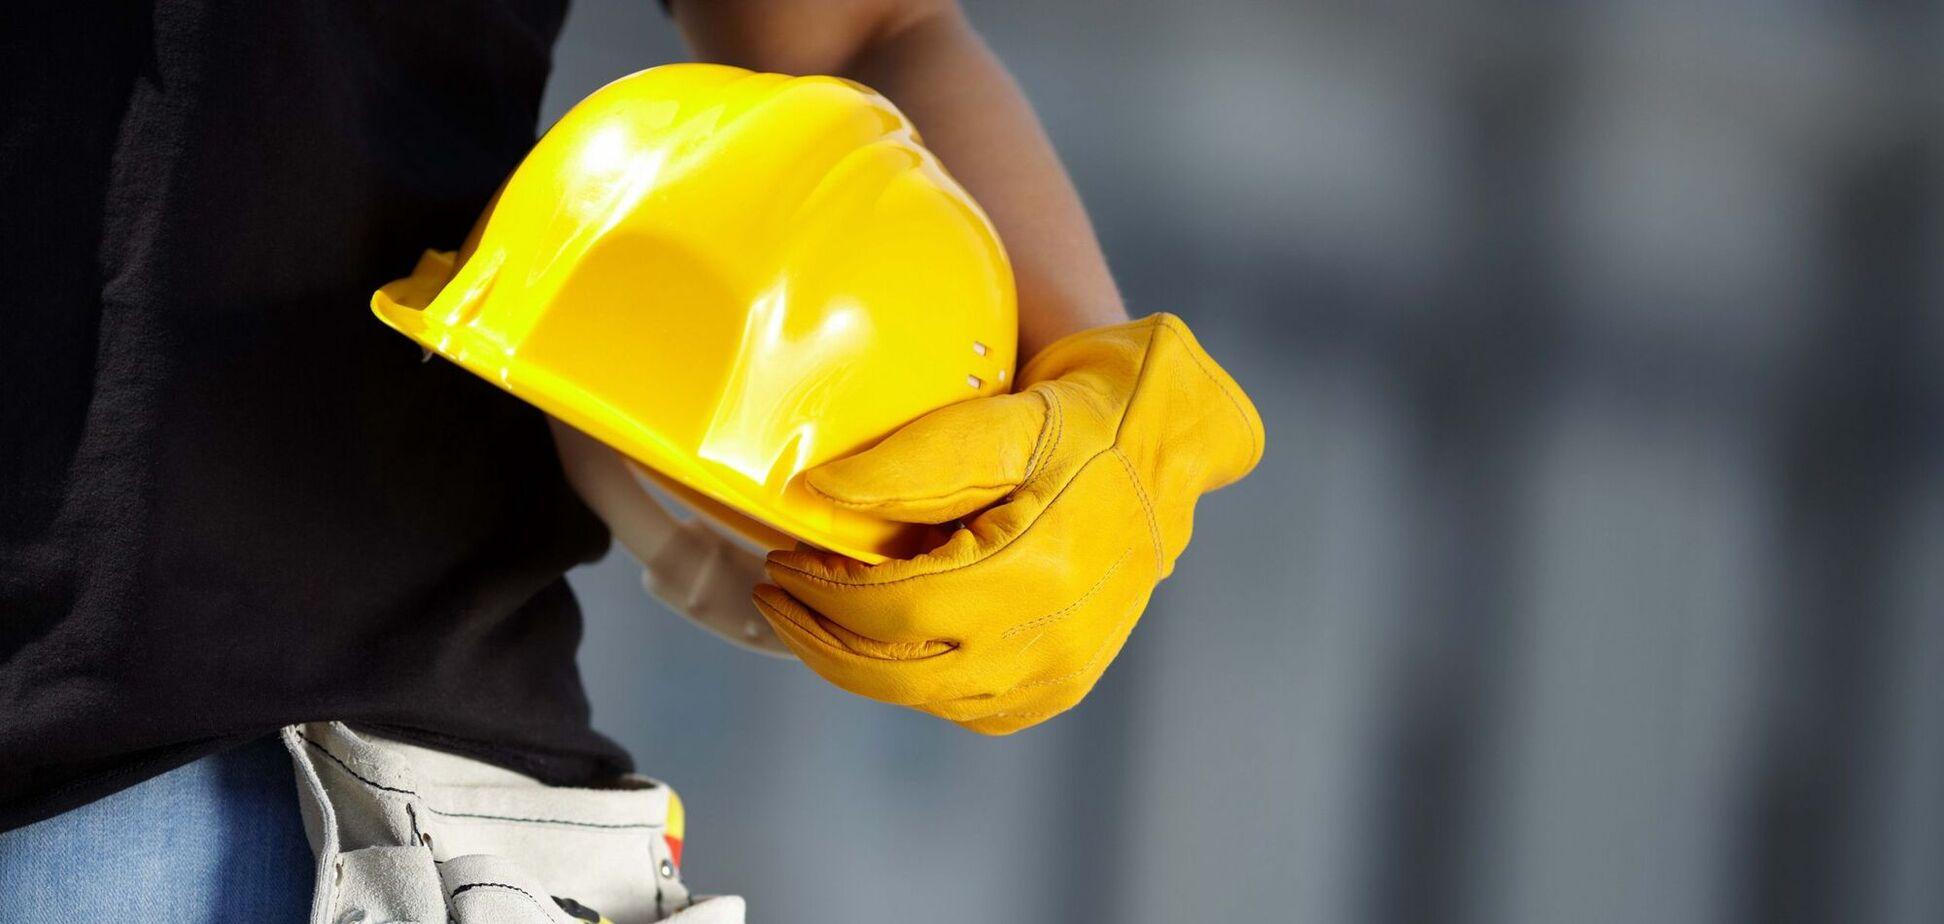 В Днепре на стройке погиб 21-летний рабочий